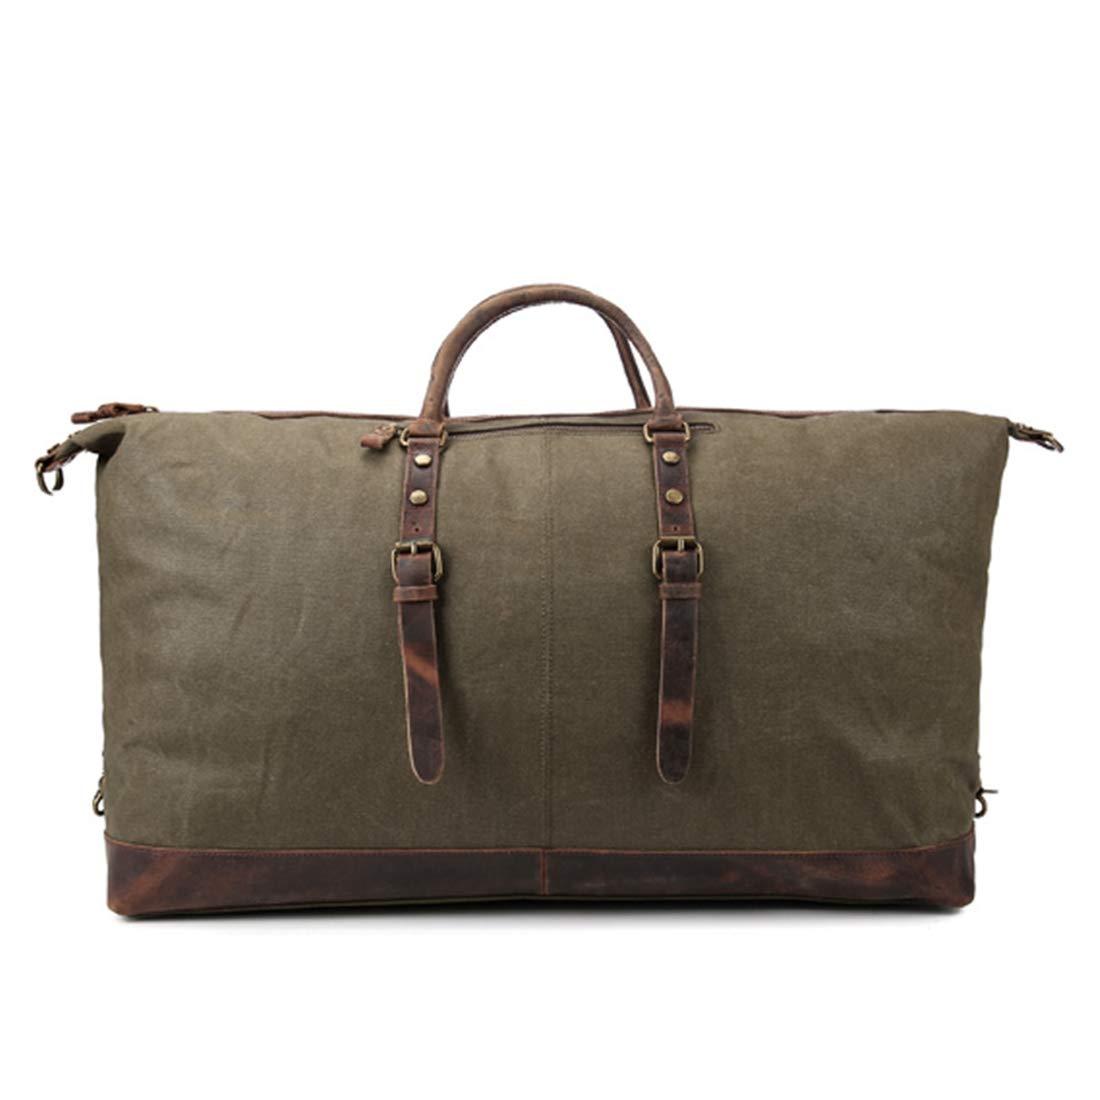 CeSuoLBD 旅行バッグワックスキャンバスのハンドバッグバッグ旅行の旅行の上の防水バッグ旅行のキャリーバッグ  アーミーグリーン B07R229SRZ